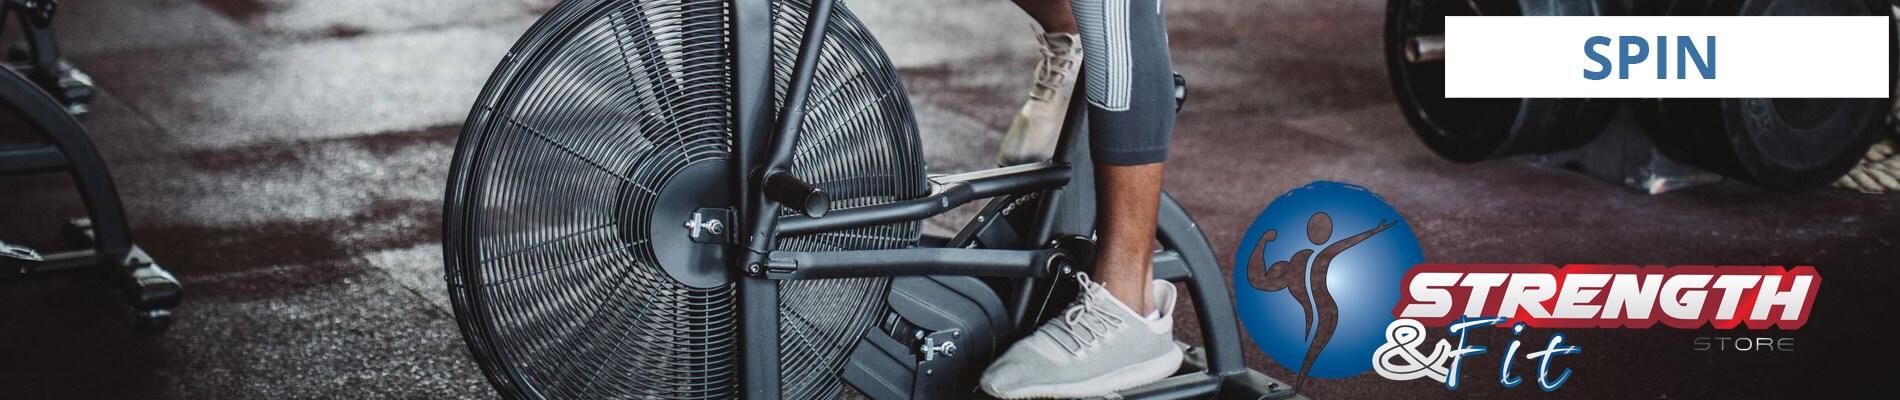 Spin Bikes (Ποδήλατα Ταχύτητας)